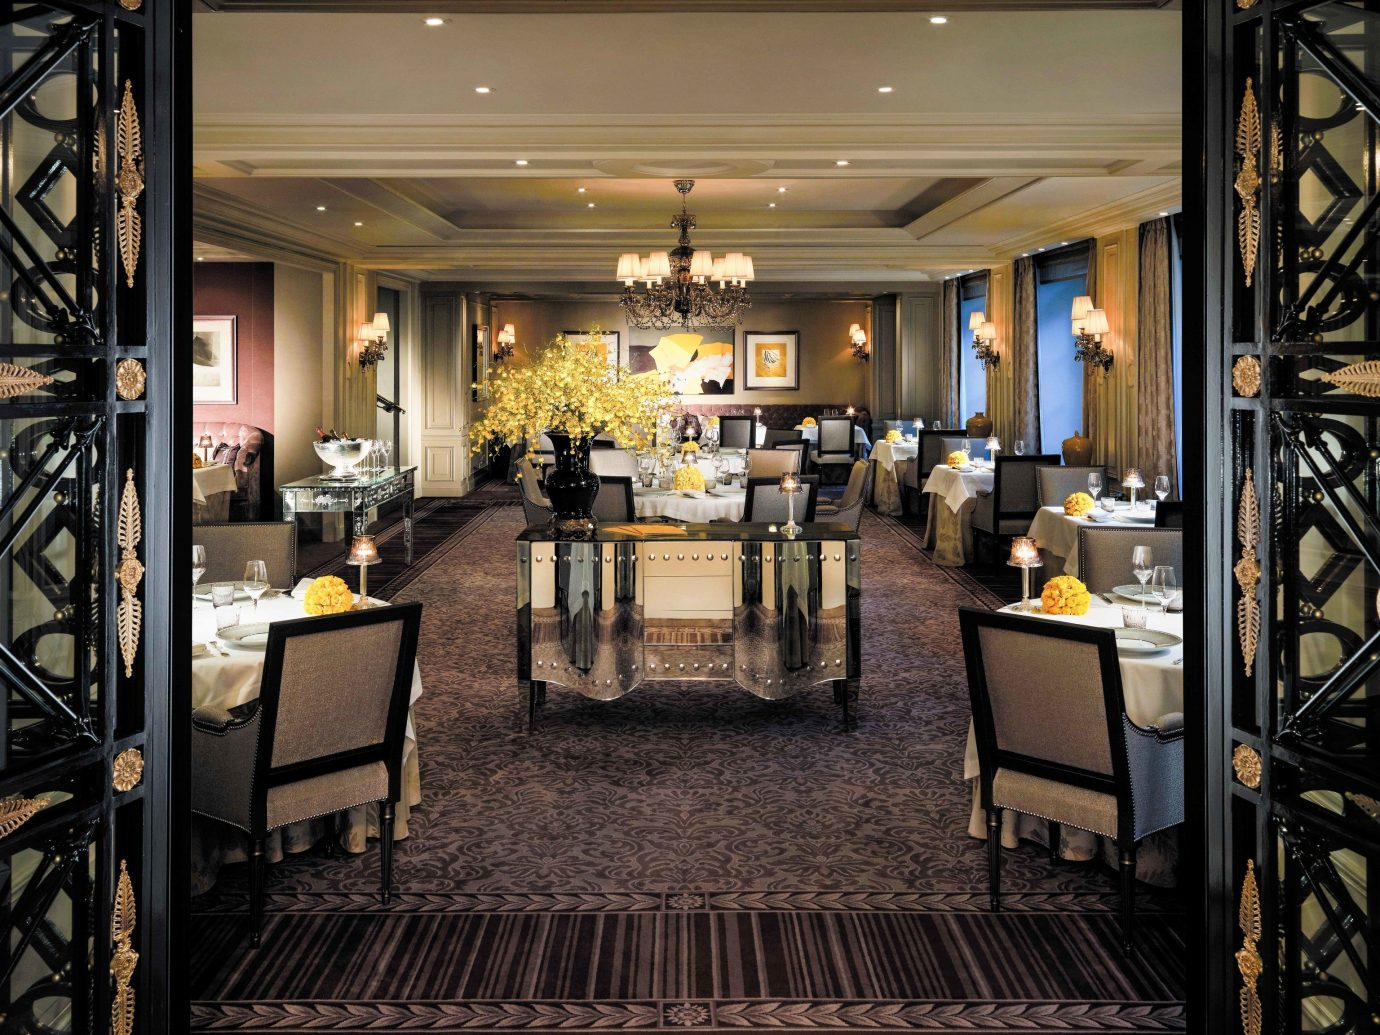 Food + Drink Romance indoor ceiling restaurant interior design dining room function hall Lobby flooring furniture